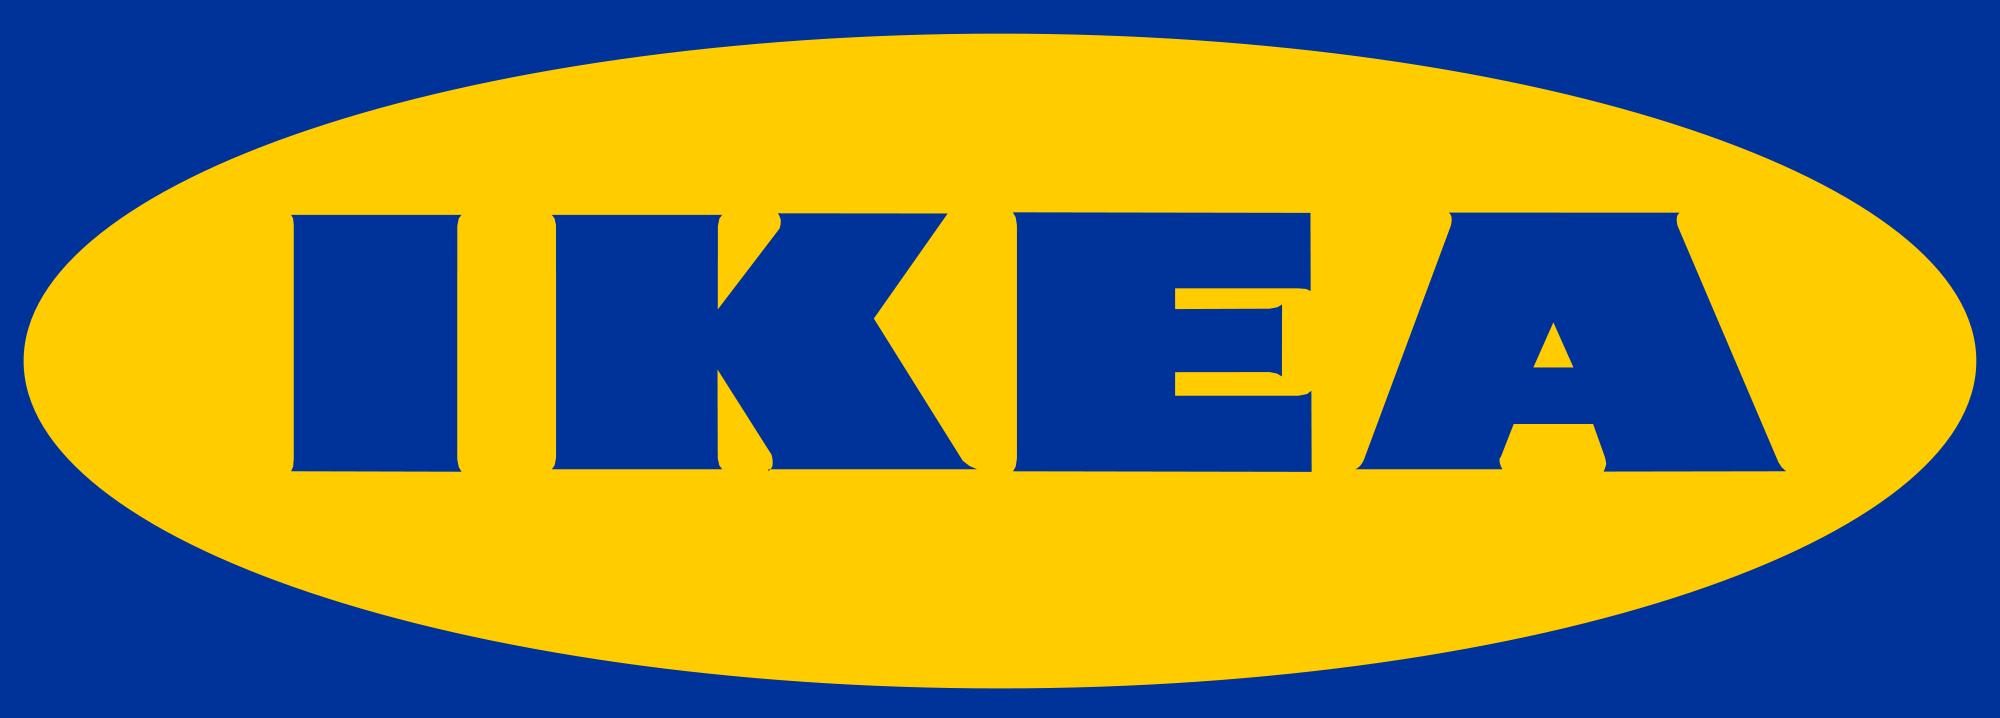 2000px-Ikea_logo_svg